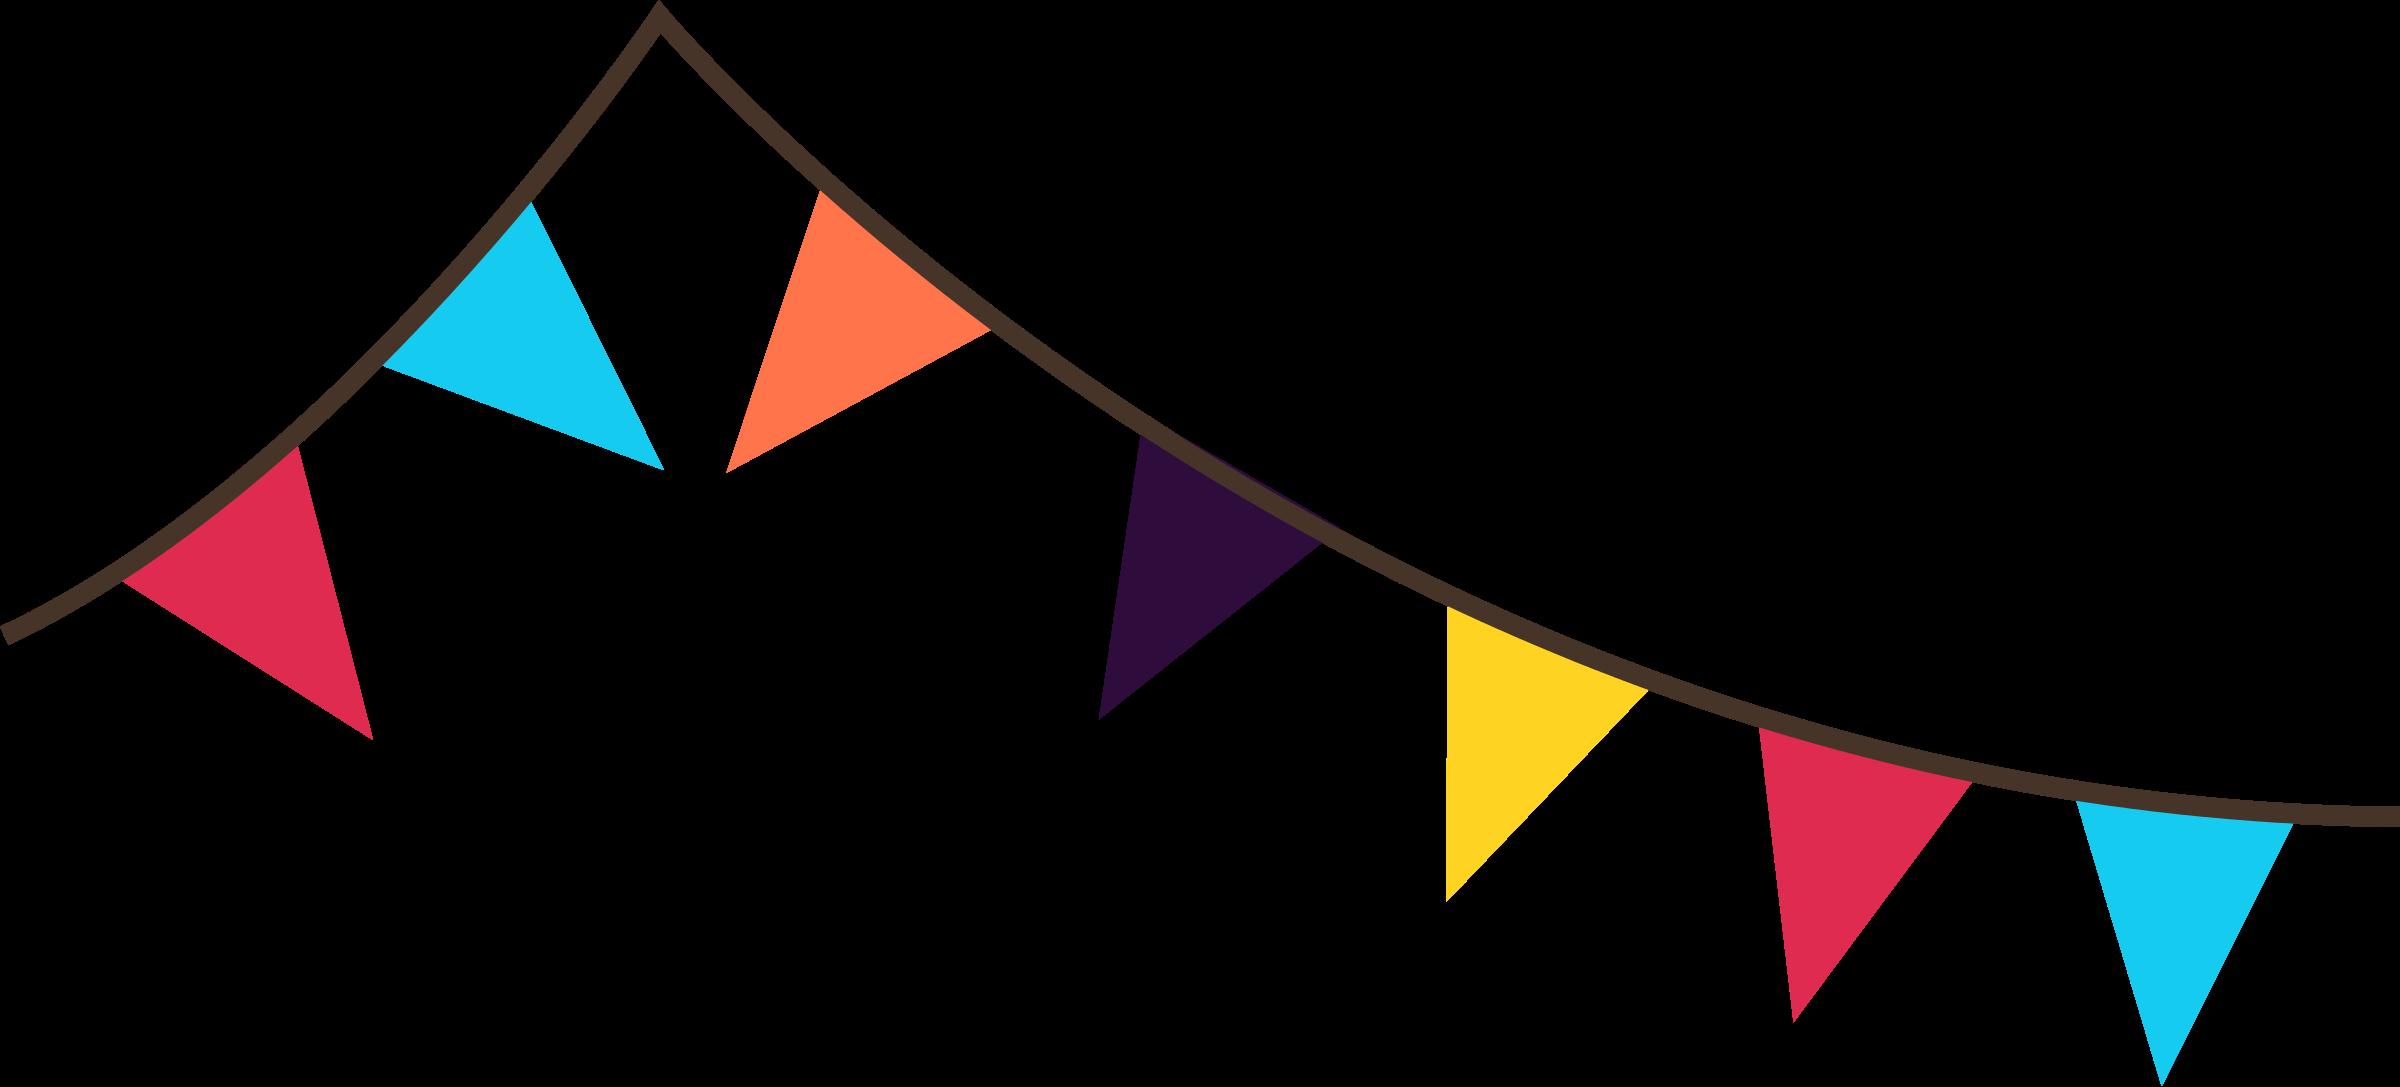 2400x1087 Carnival Clipart Pennant Banner Clip Art